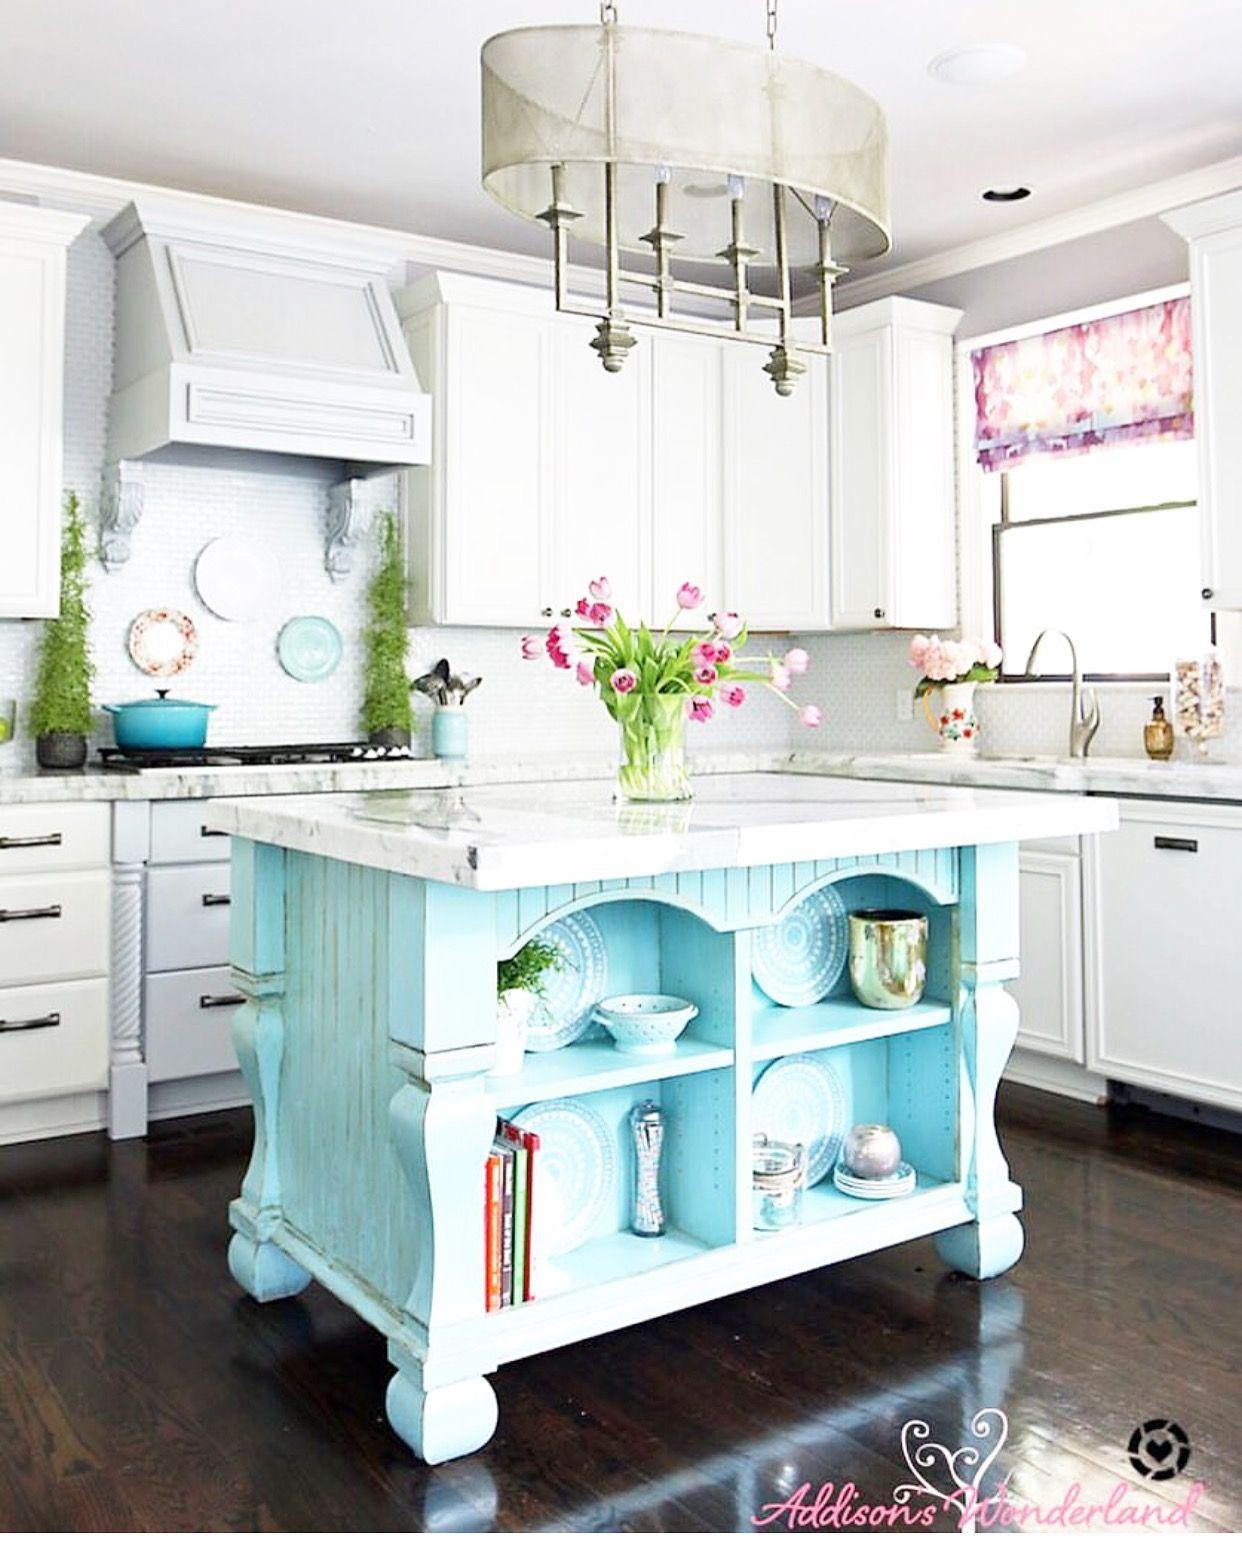 Aqua pink kitchen of dreams Kitchen design, Grey